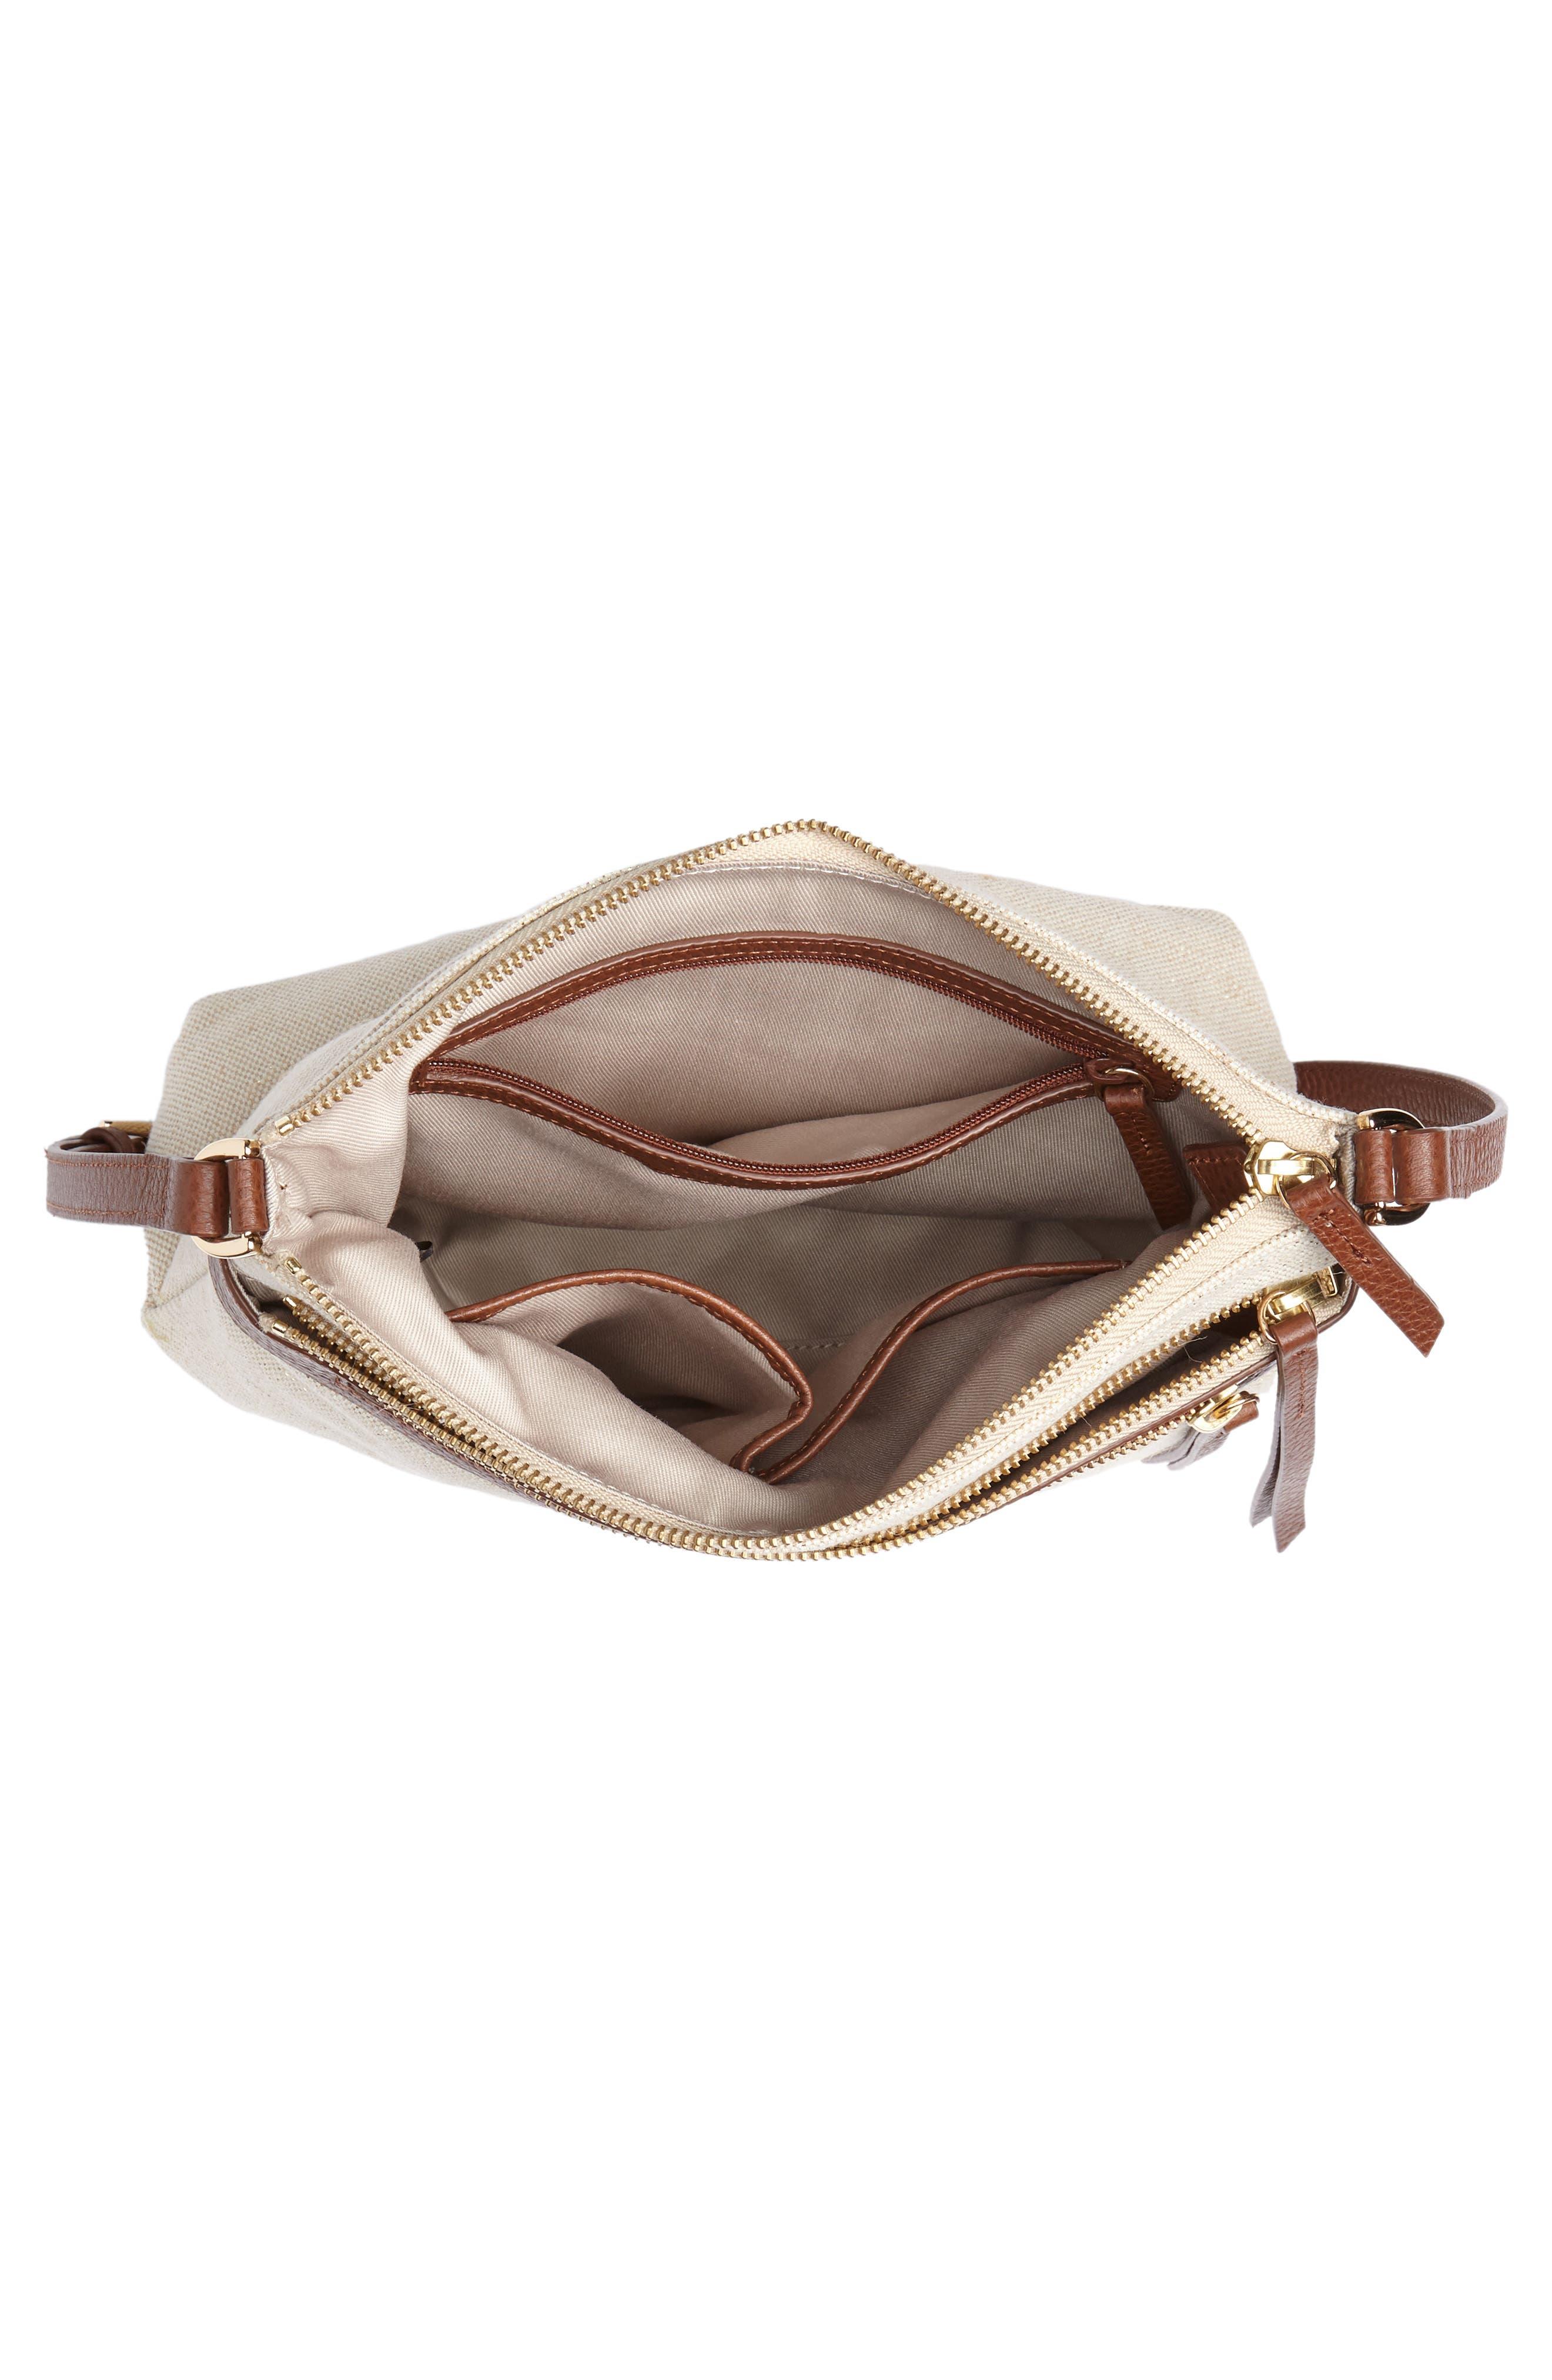 Kaison Linen & Leather Crossbody Bag,                             Alternate thumbnail 4, color,                             NATURAL/ GOLD